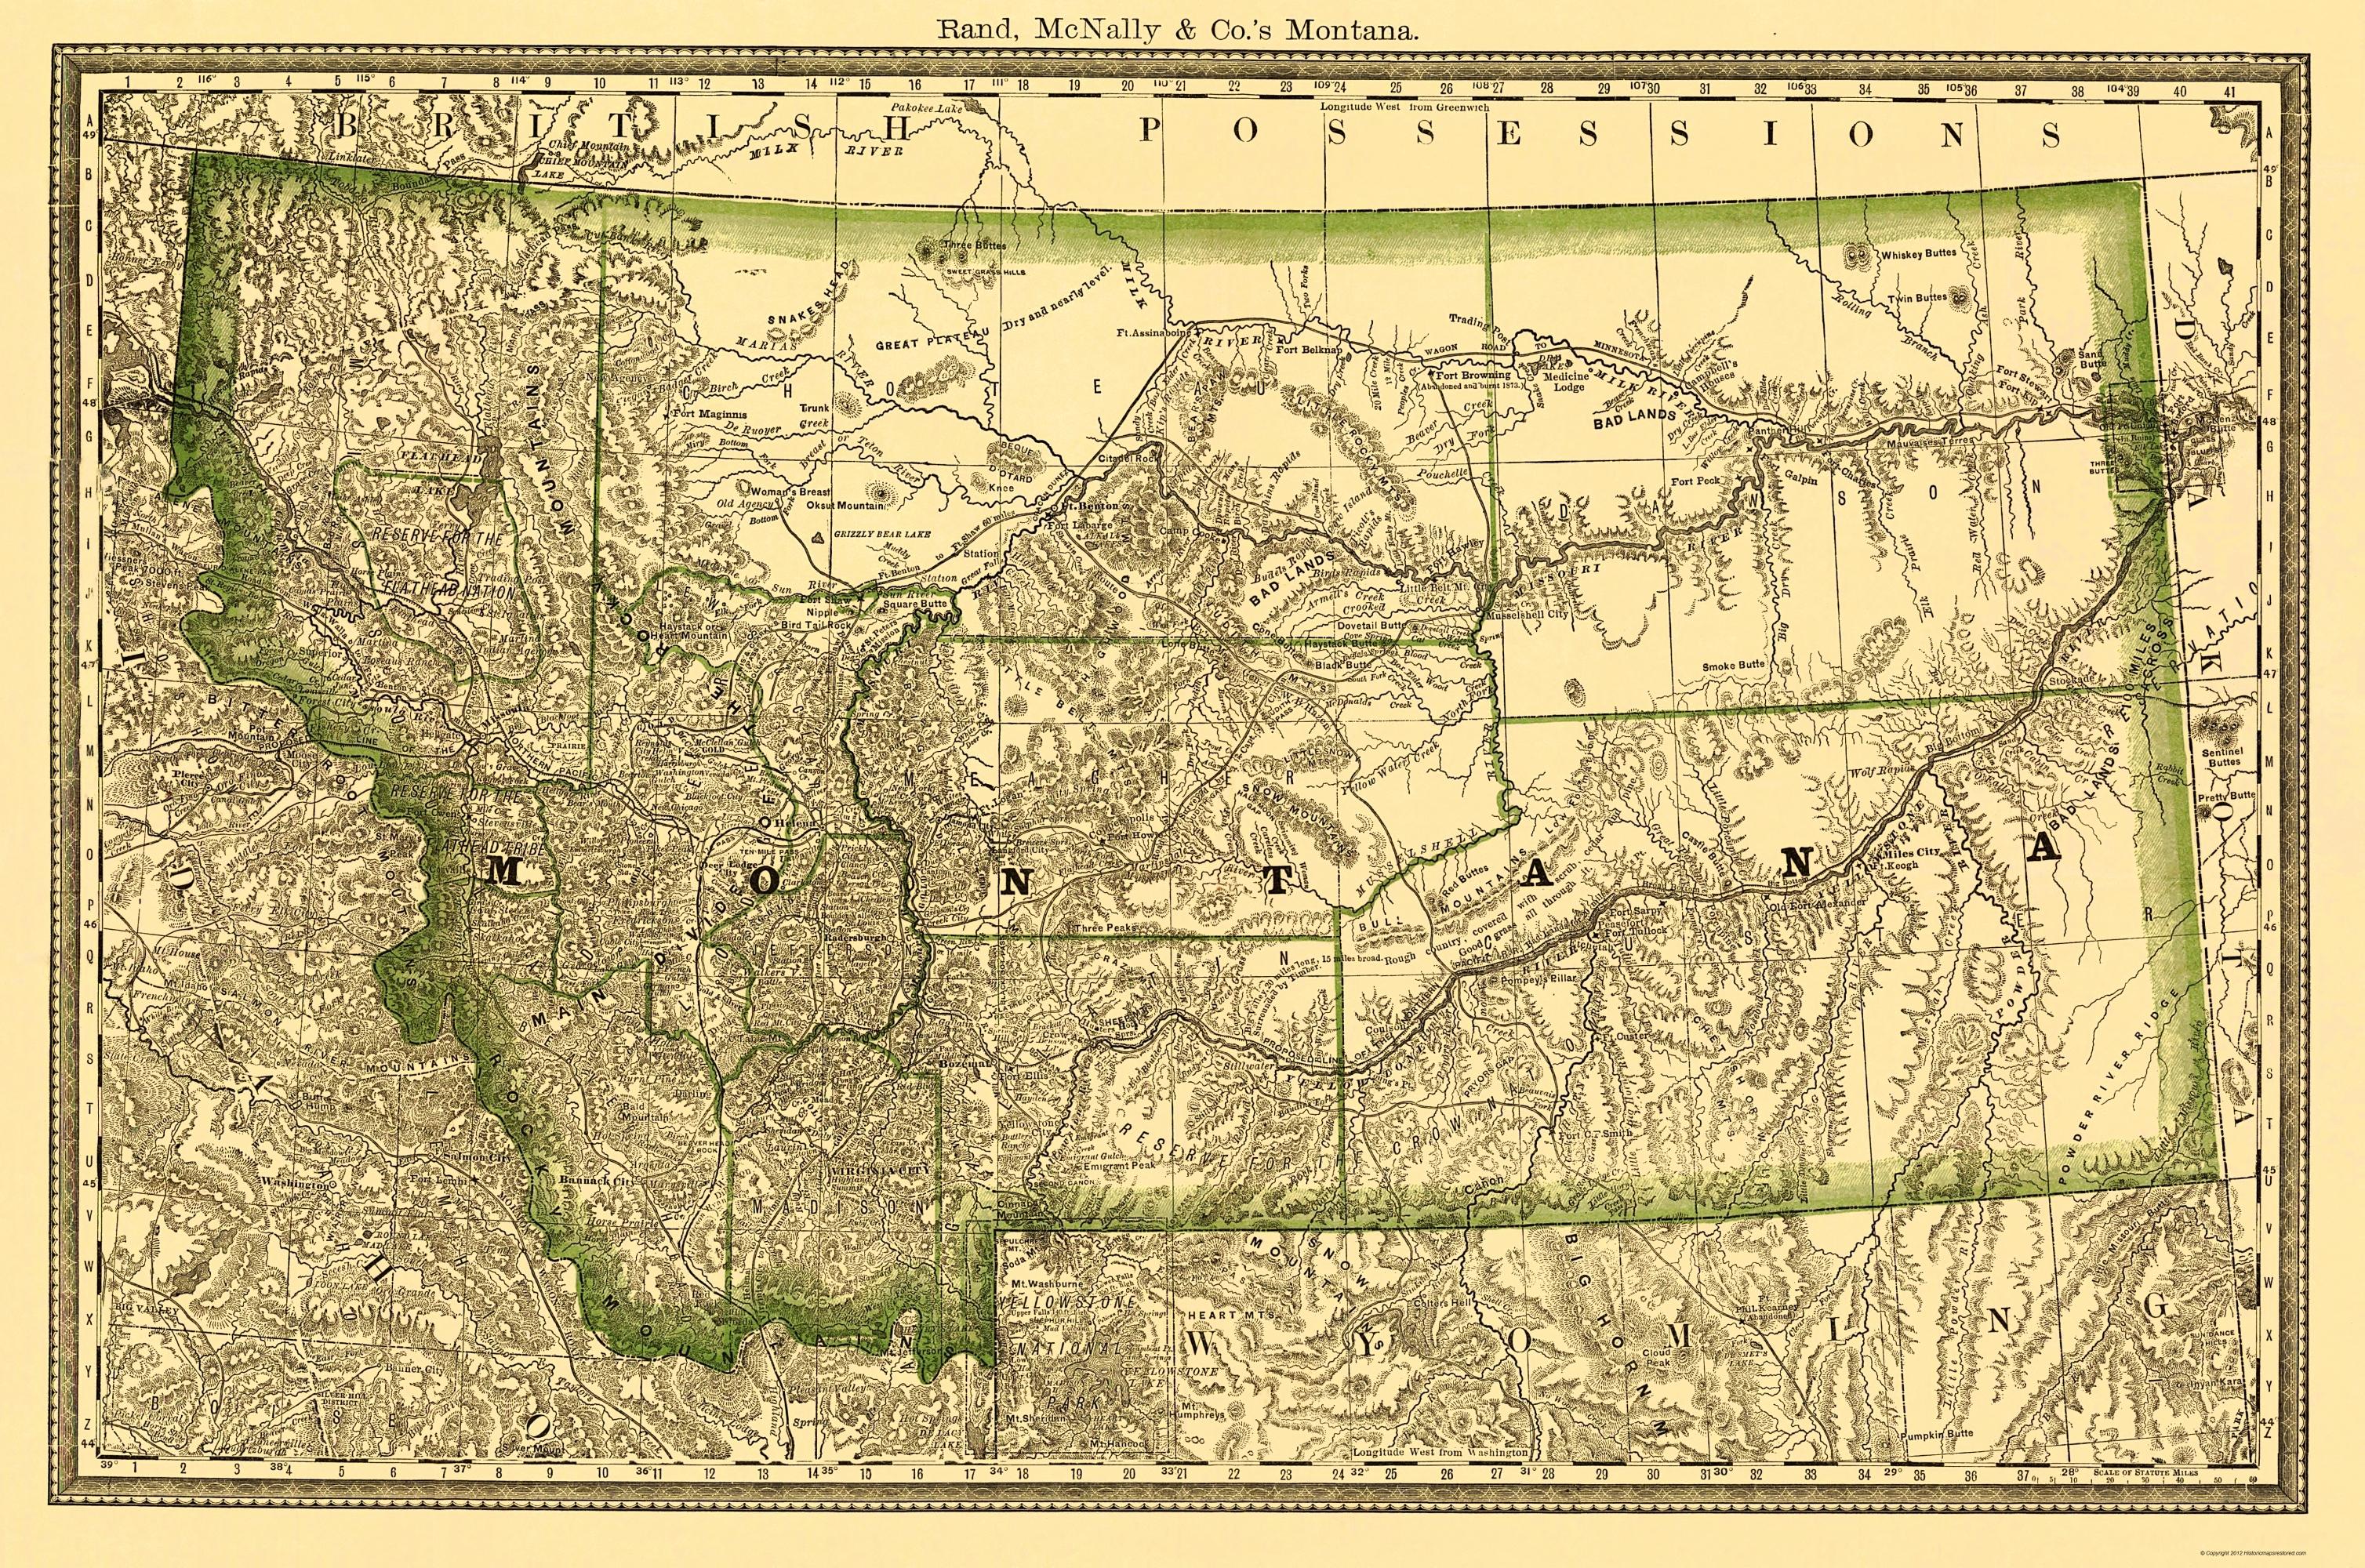 Old State Map - Montana - Rand McNally 1881 - 23 x 34.68